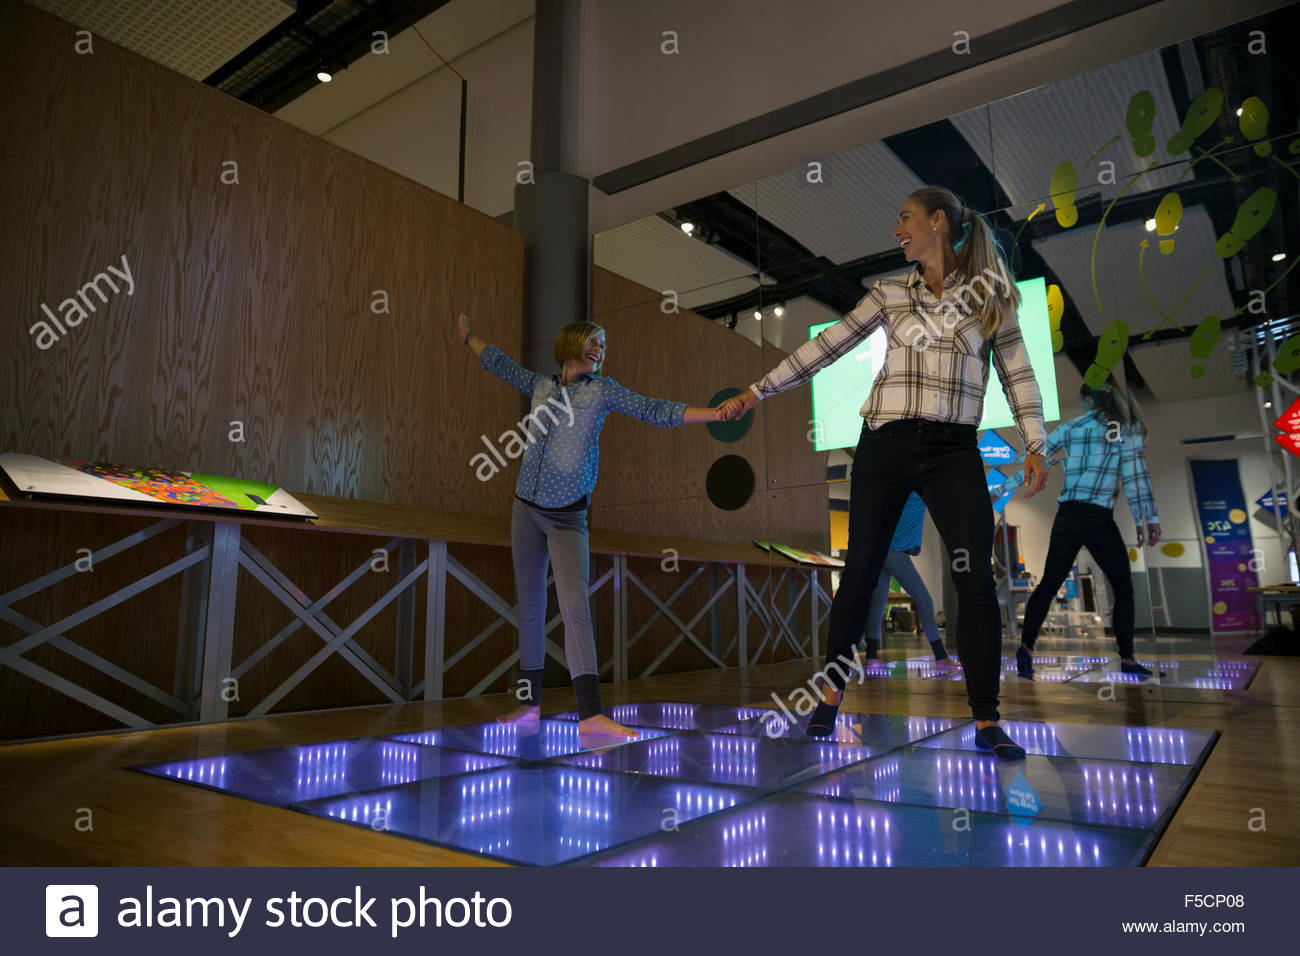 Mother daughter dancing illuminated floor science center exhibit - Stock Image